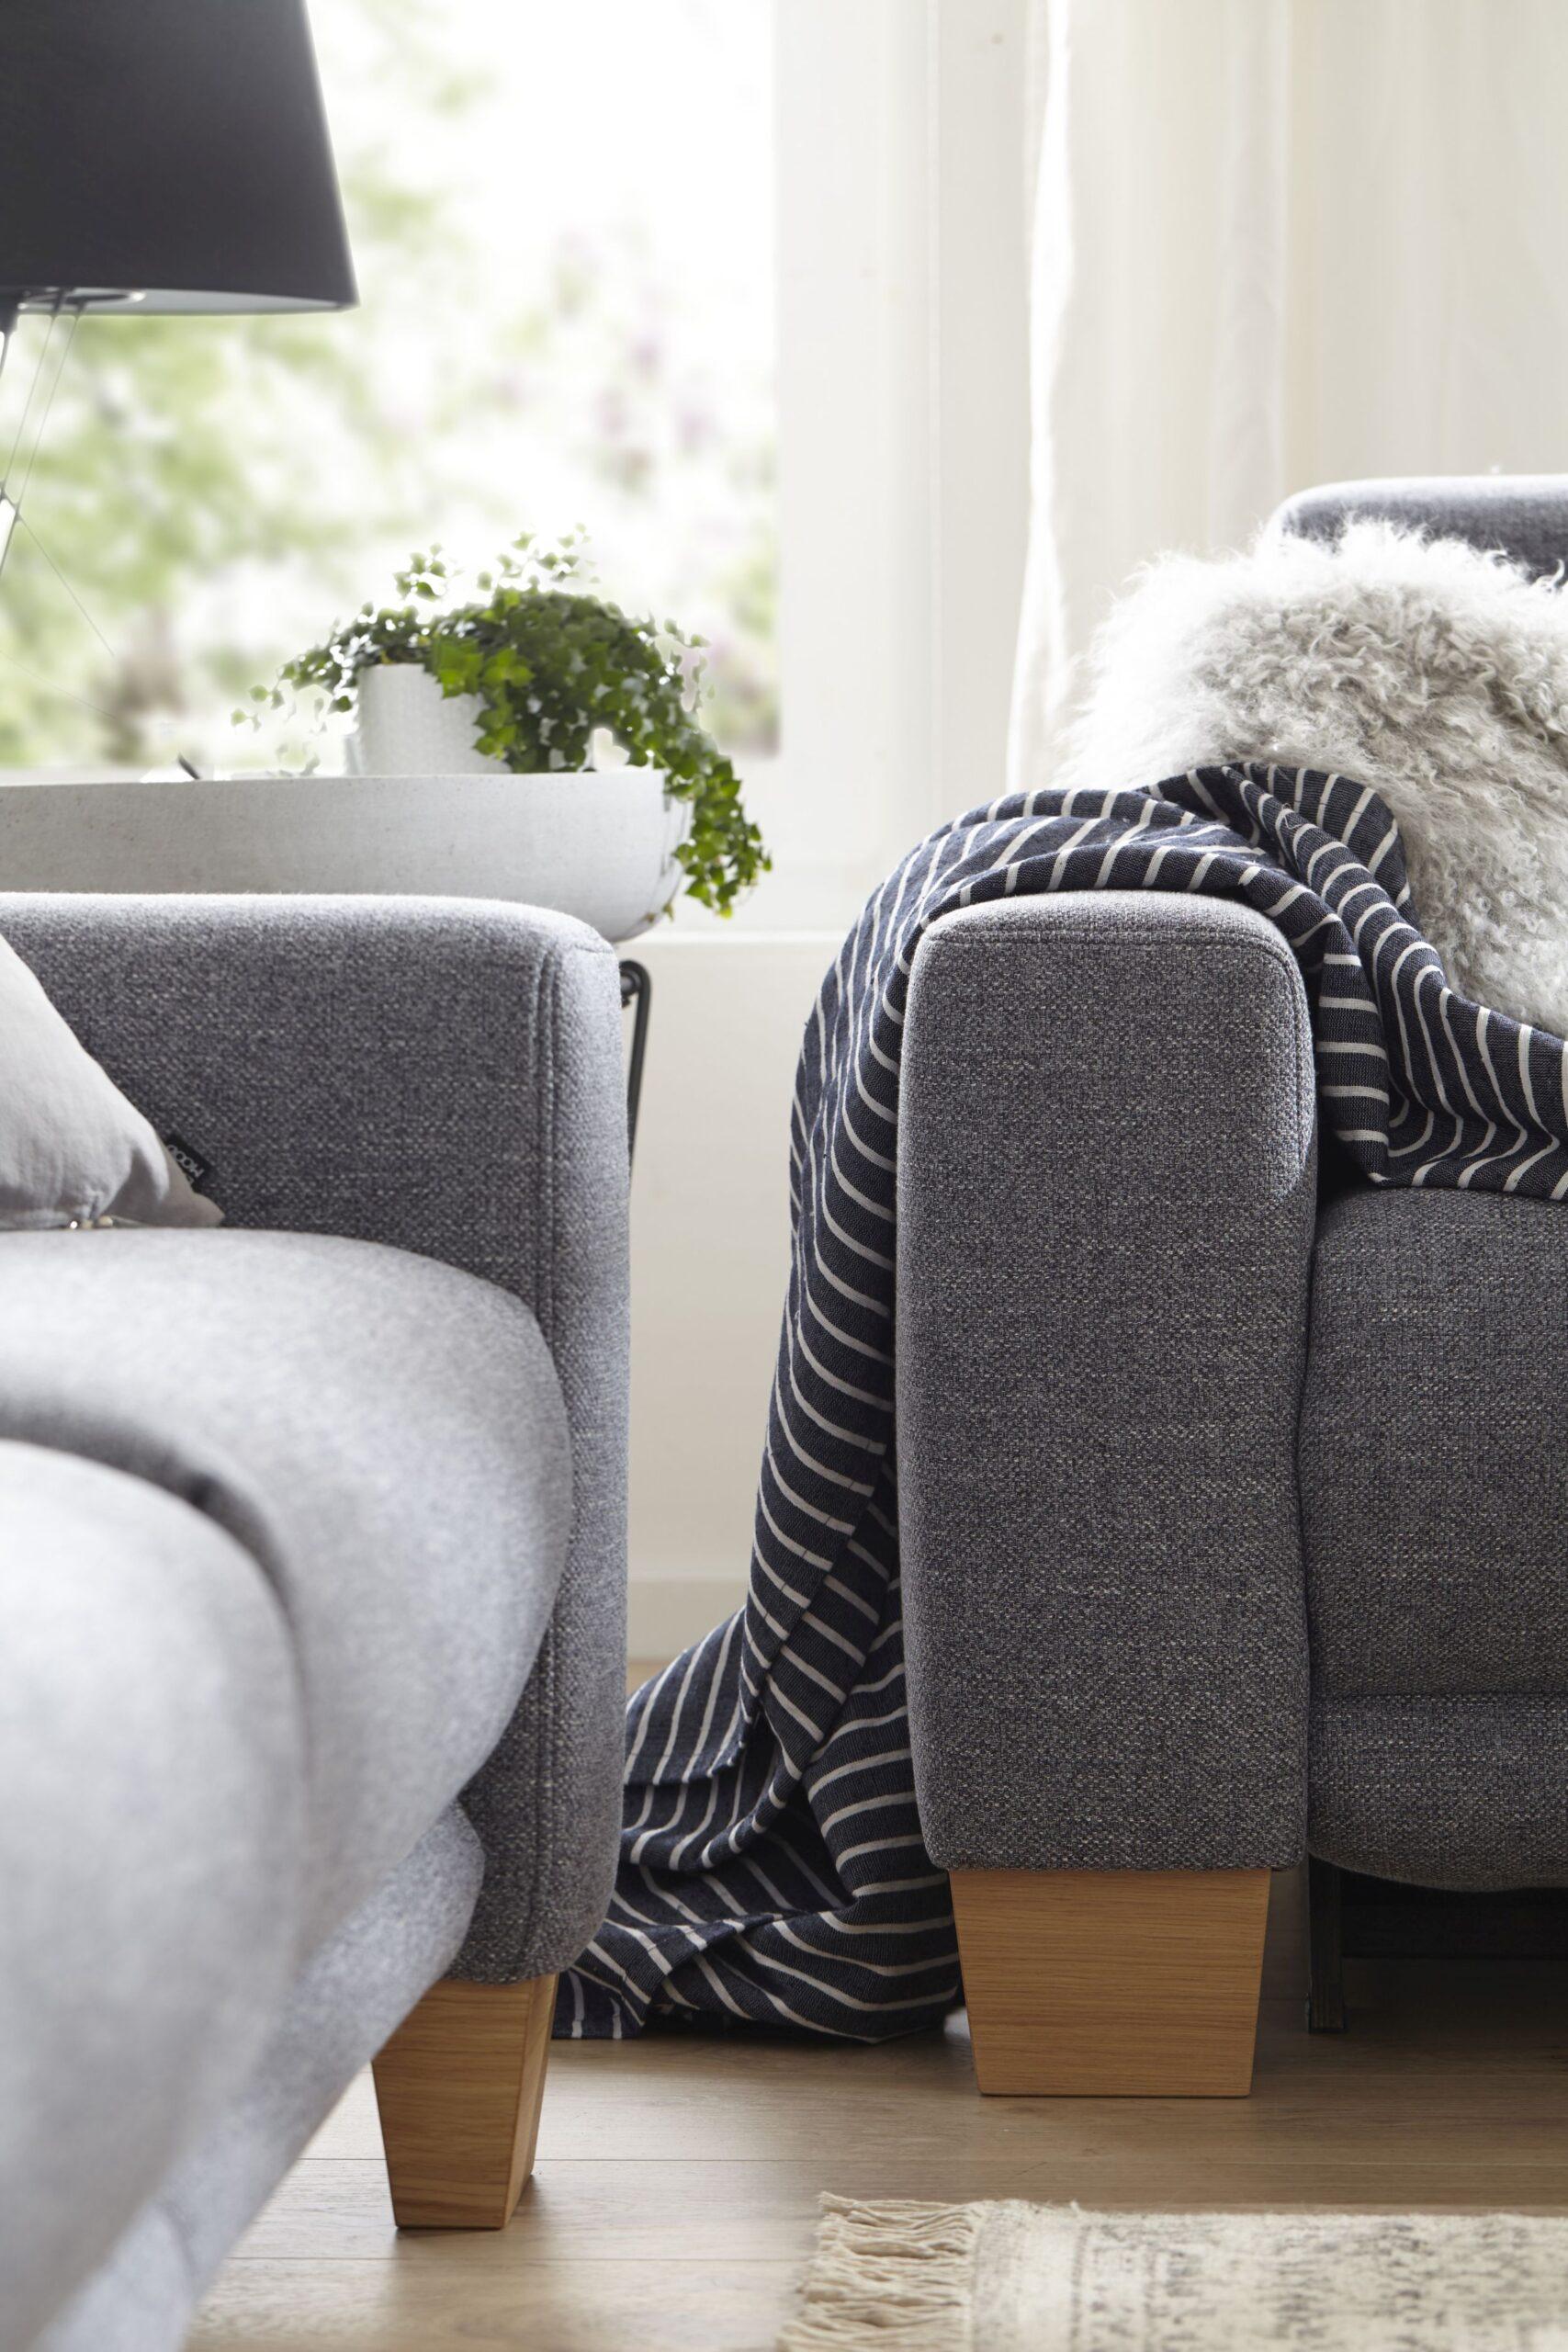 Full Size of Natura Sofa Brooklyn Couch Newport Home Denver Kaufen Kansas Livingston Gebraucht Pasadena Love 3 Sitzer Maryland In Blau Mbelhaus Pohl Luxus Billig Grau Leder Sofa Natura Sofa